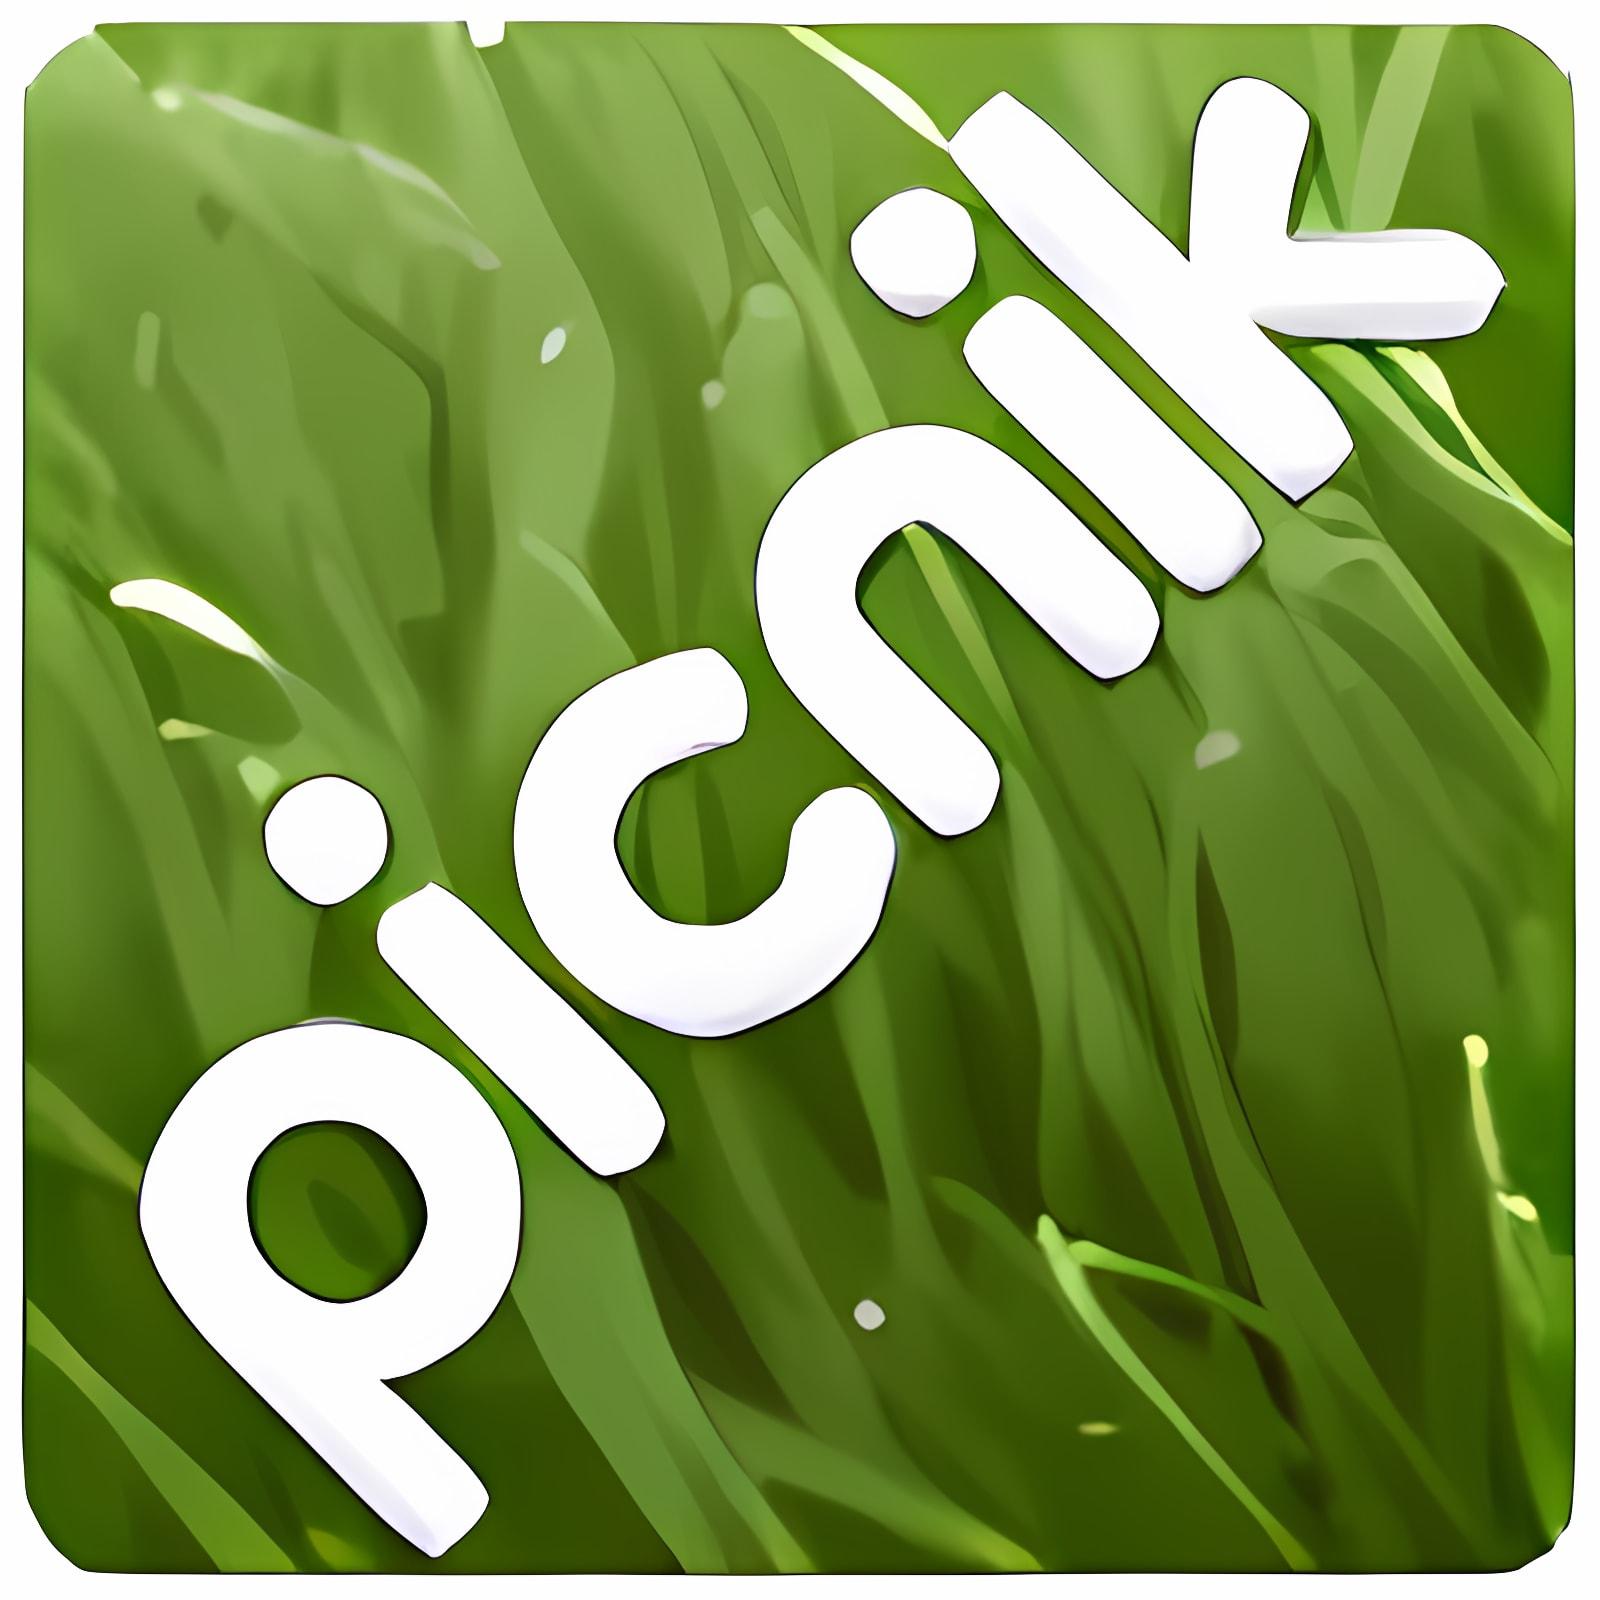 Picnik 1.0 (Internet Explorer)